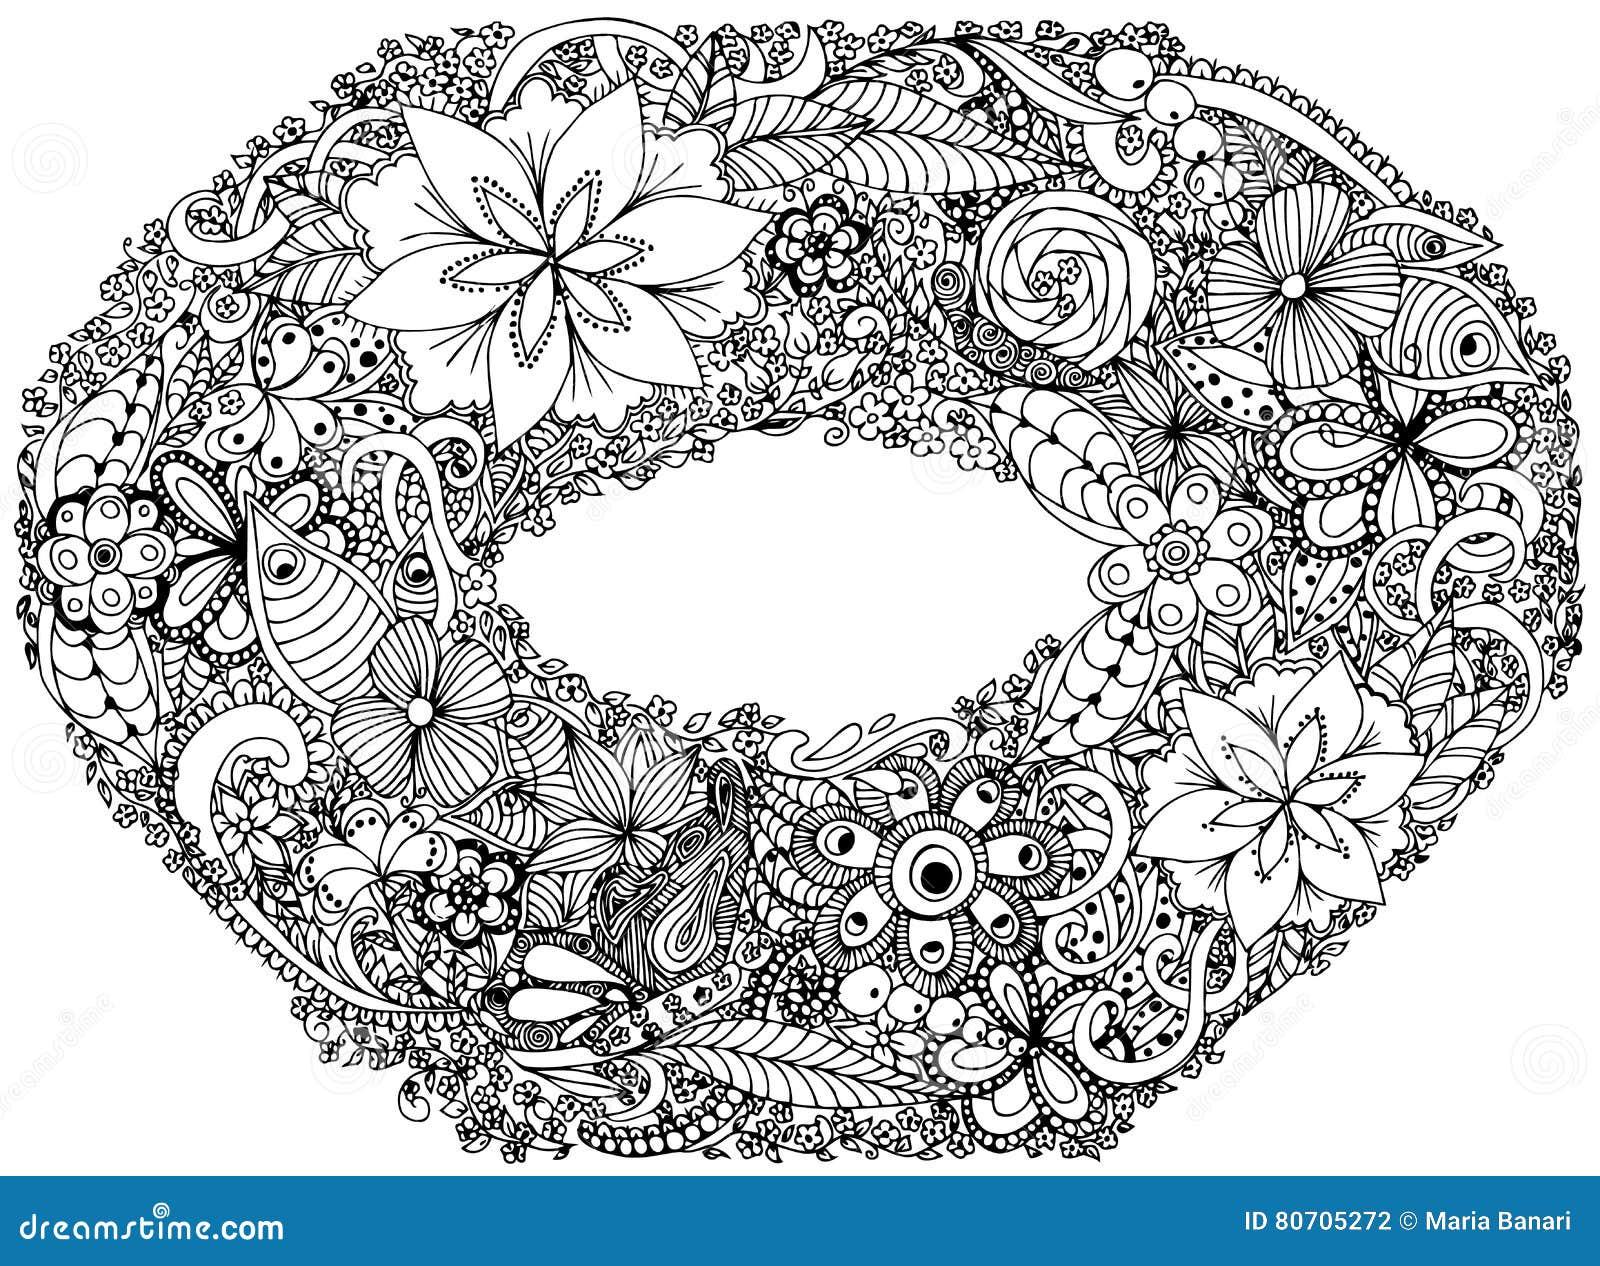 Coloriage Guirlande Fleurs.Cadre De Photo Guirlande Guirlande Couronne Anneau De